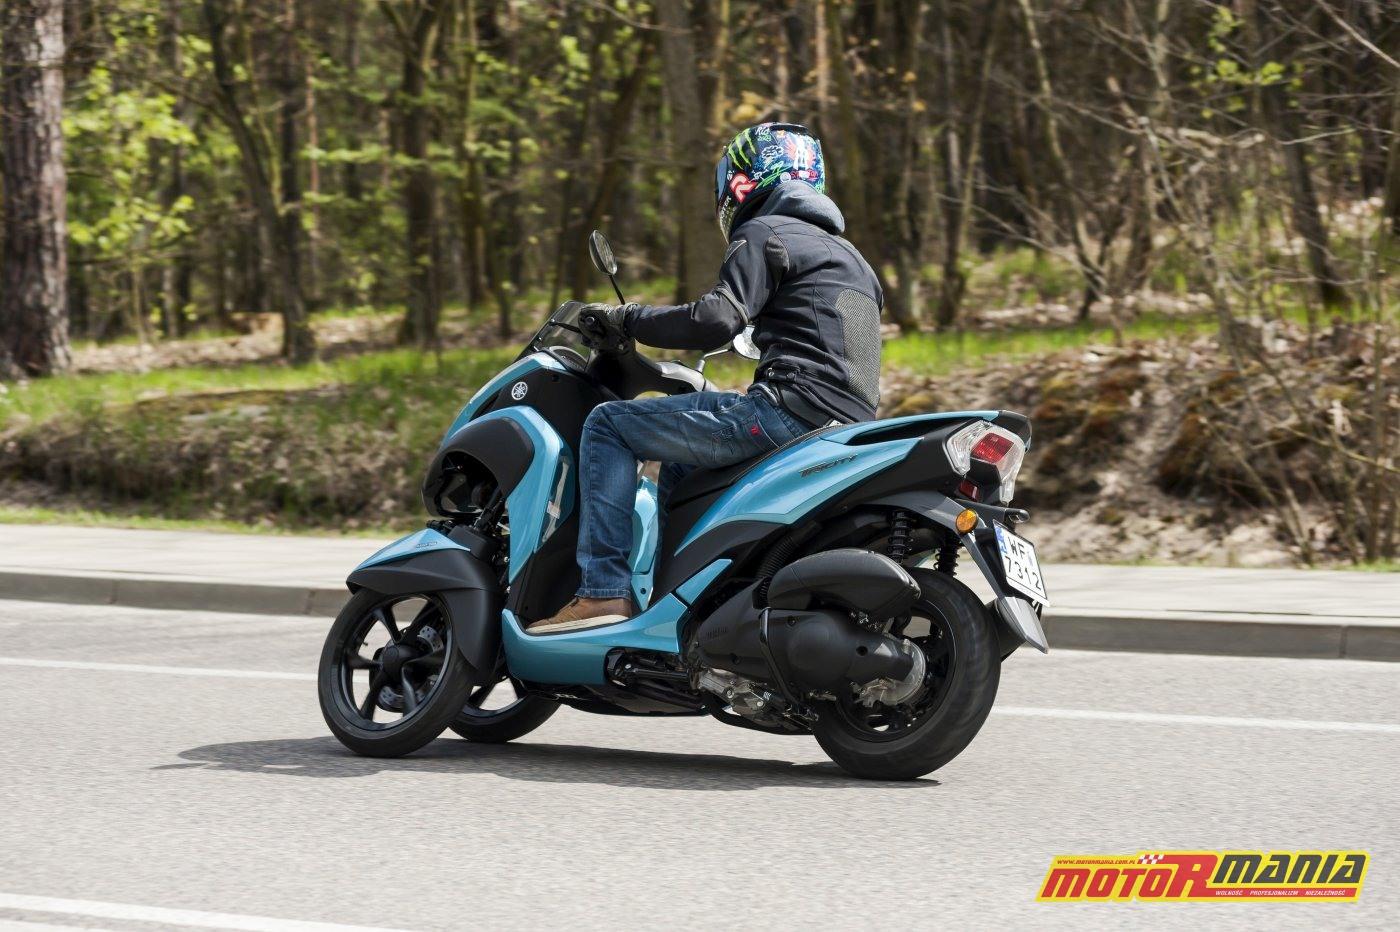 Yamaha Tricity 125 test motormania - fot Tomazi_pl (2)